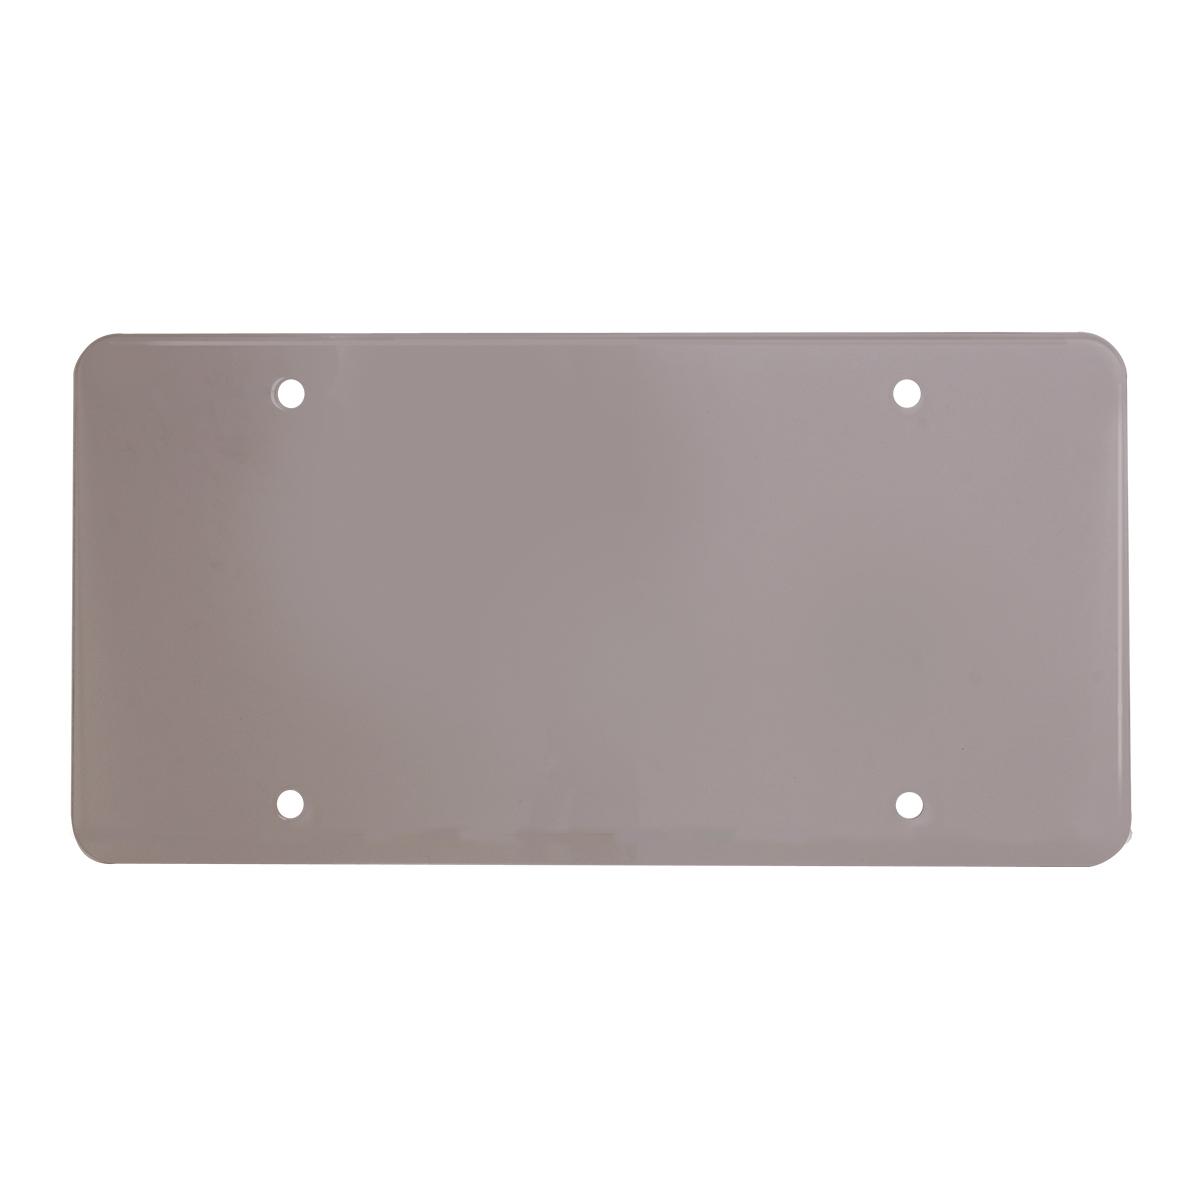 Flat License Plate Protector - Smoke